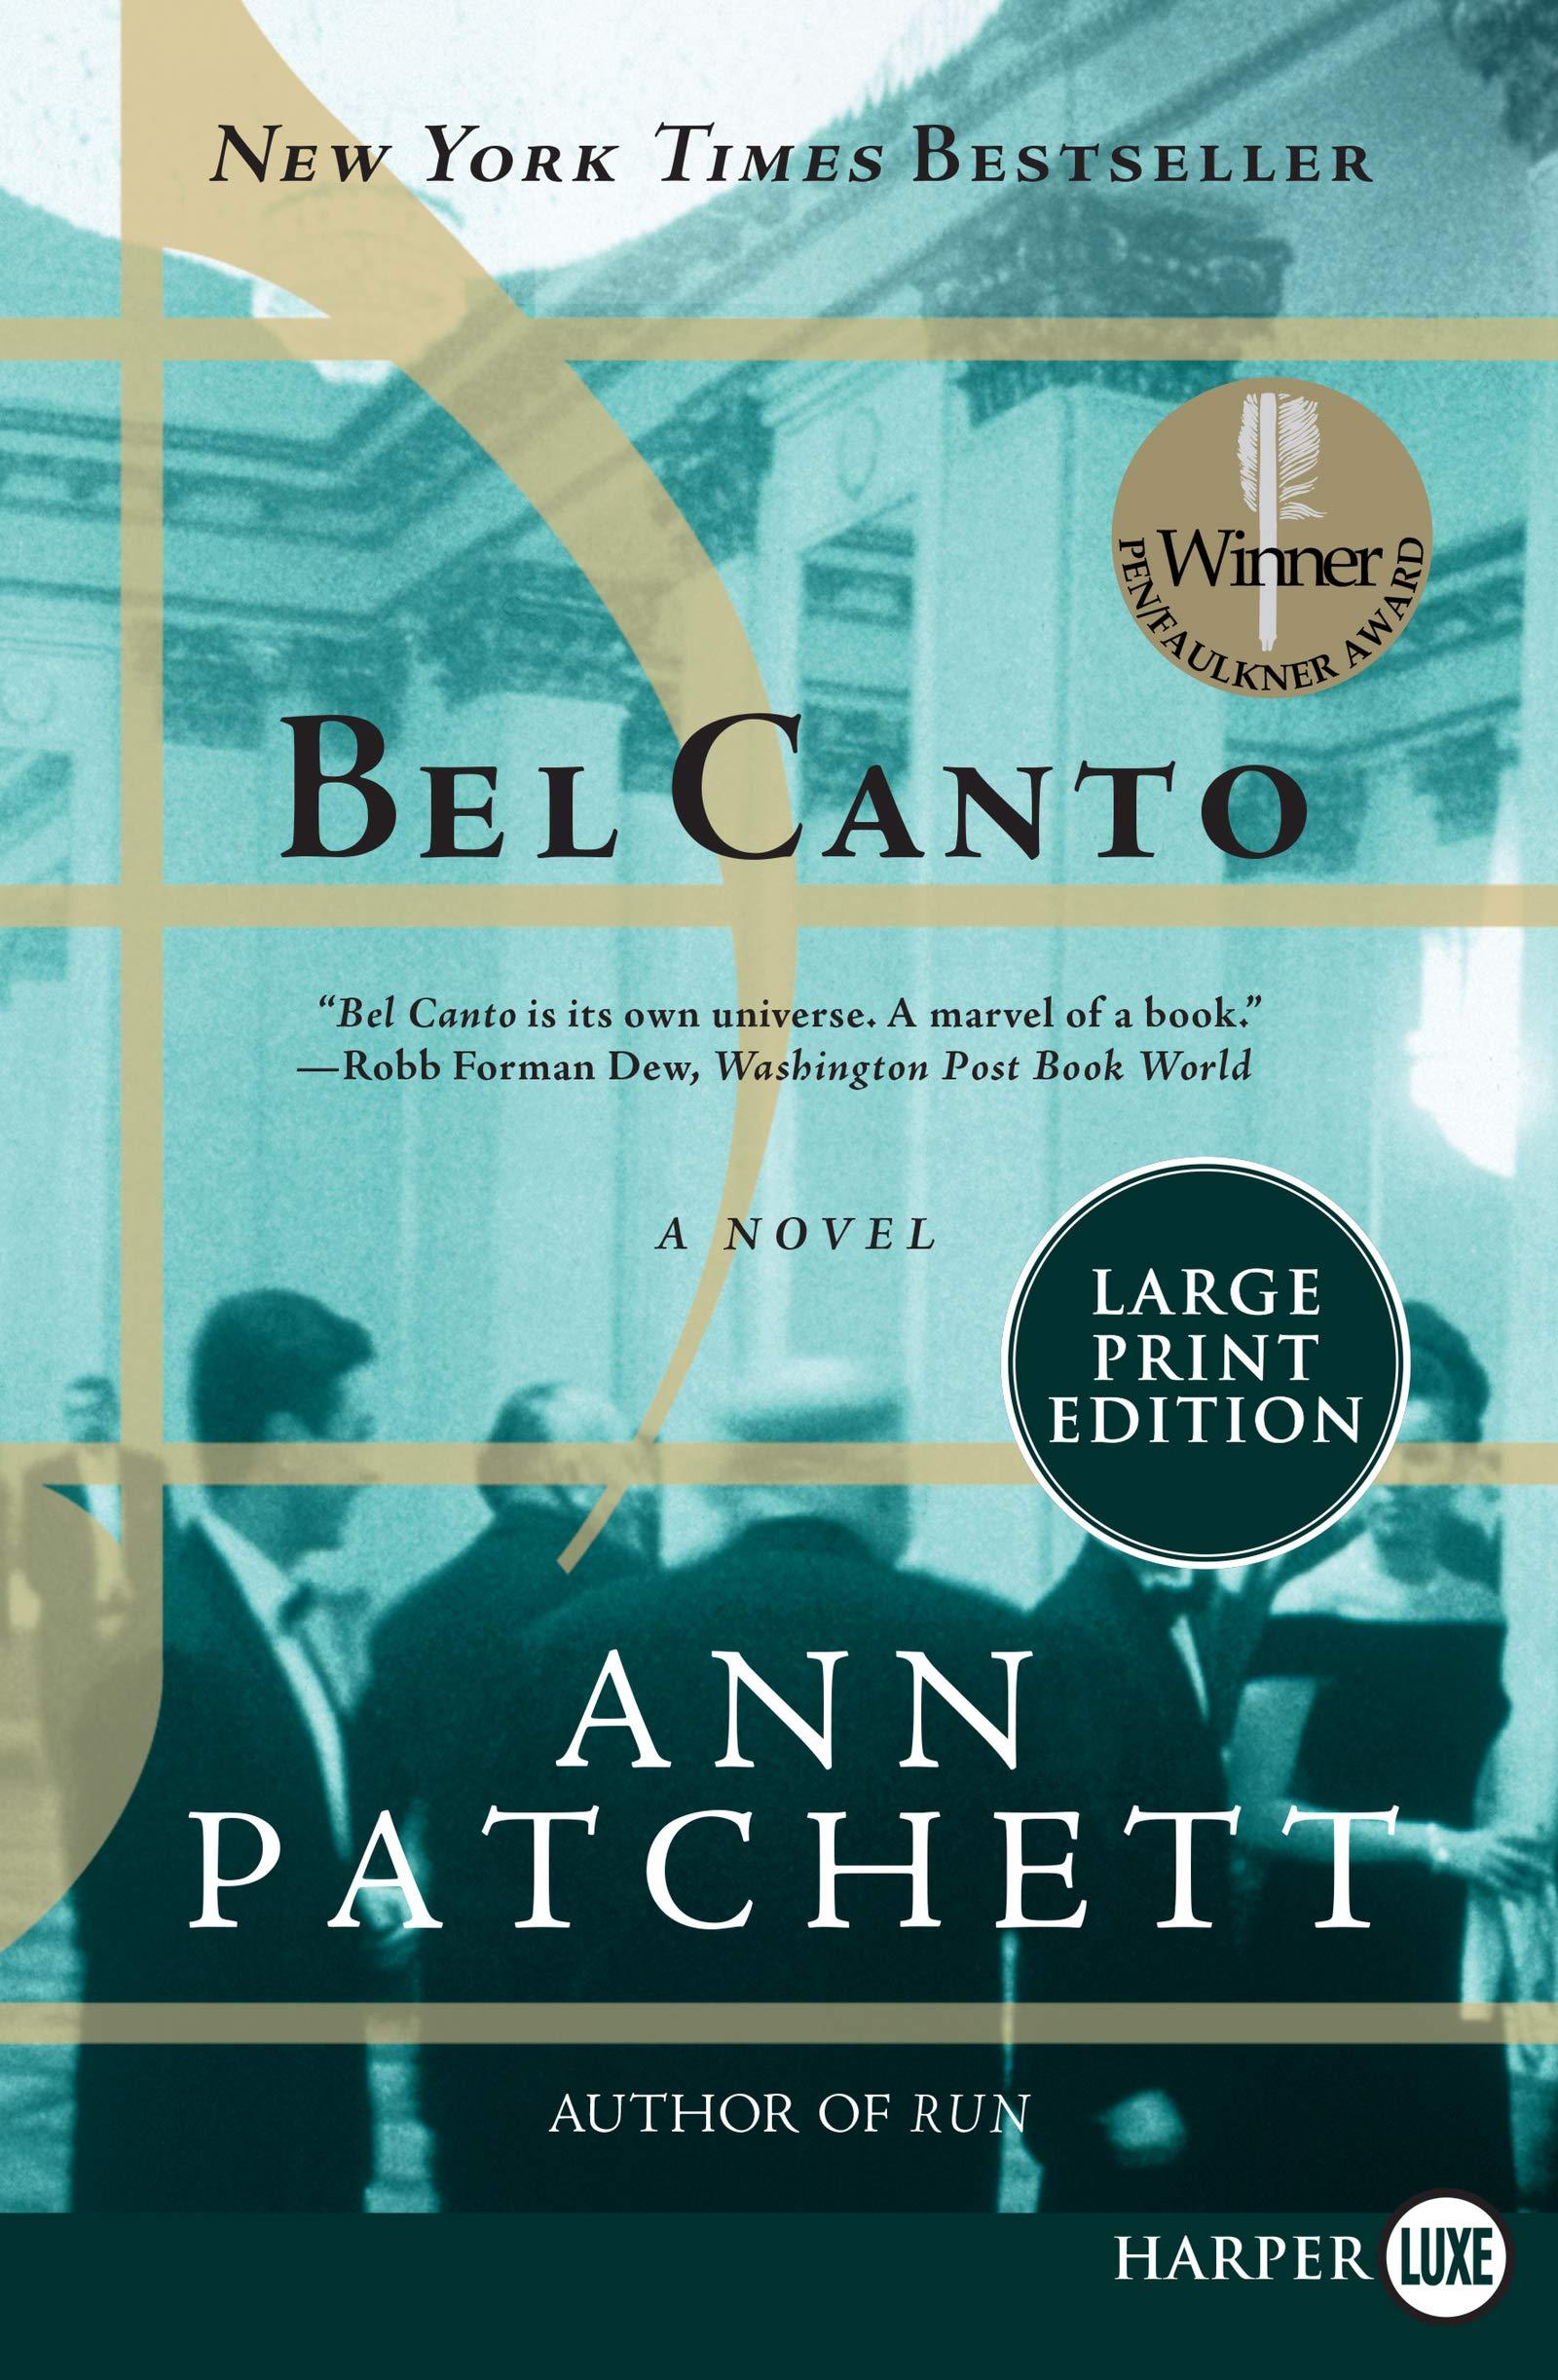 Amazon.com: Bel Canto: A Novel (9780061719868): Patchett, Ann: Books